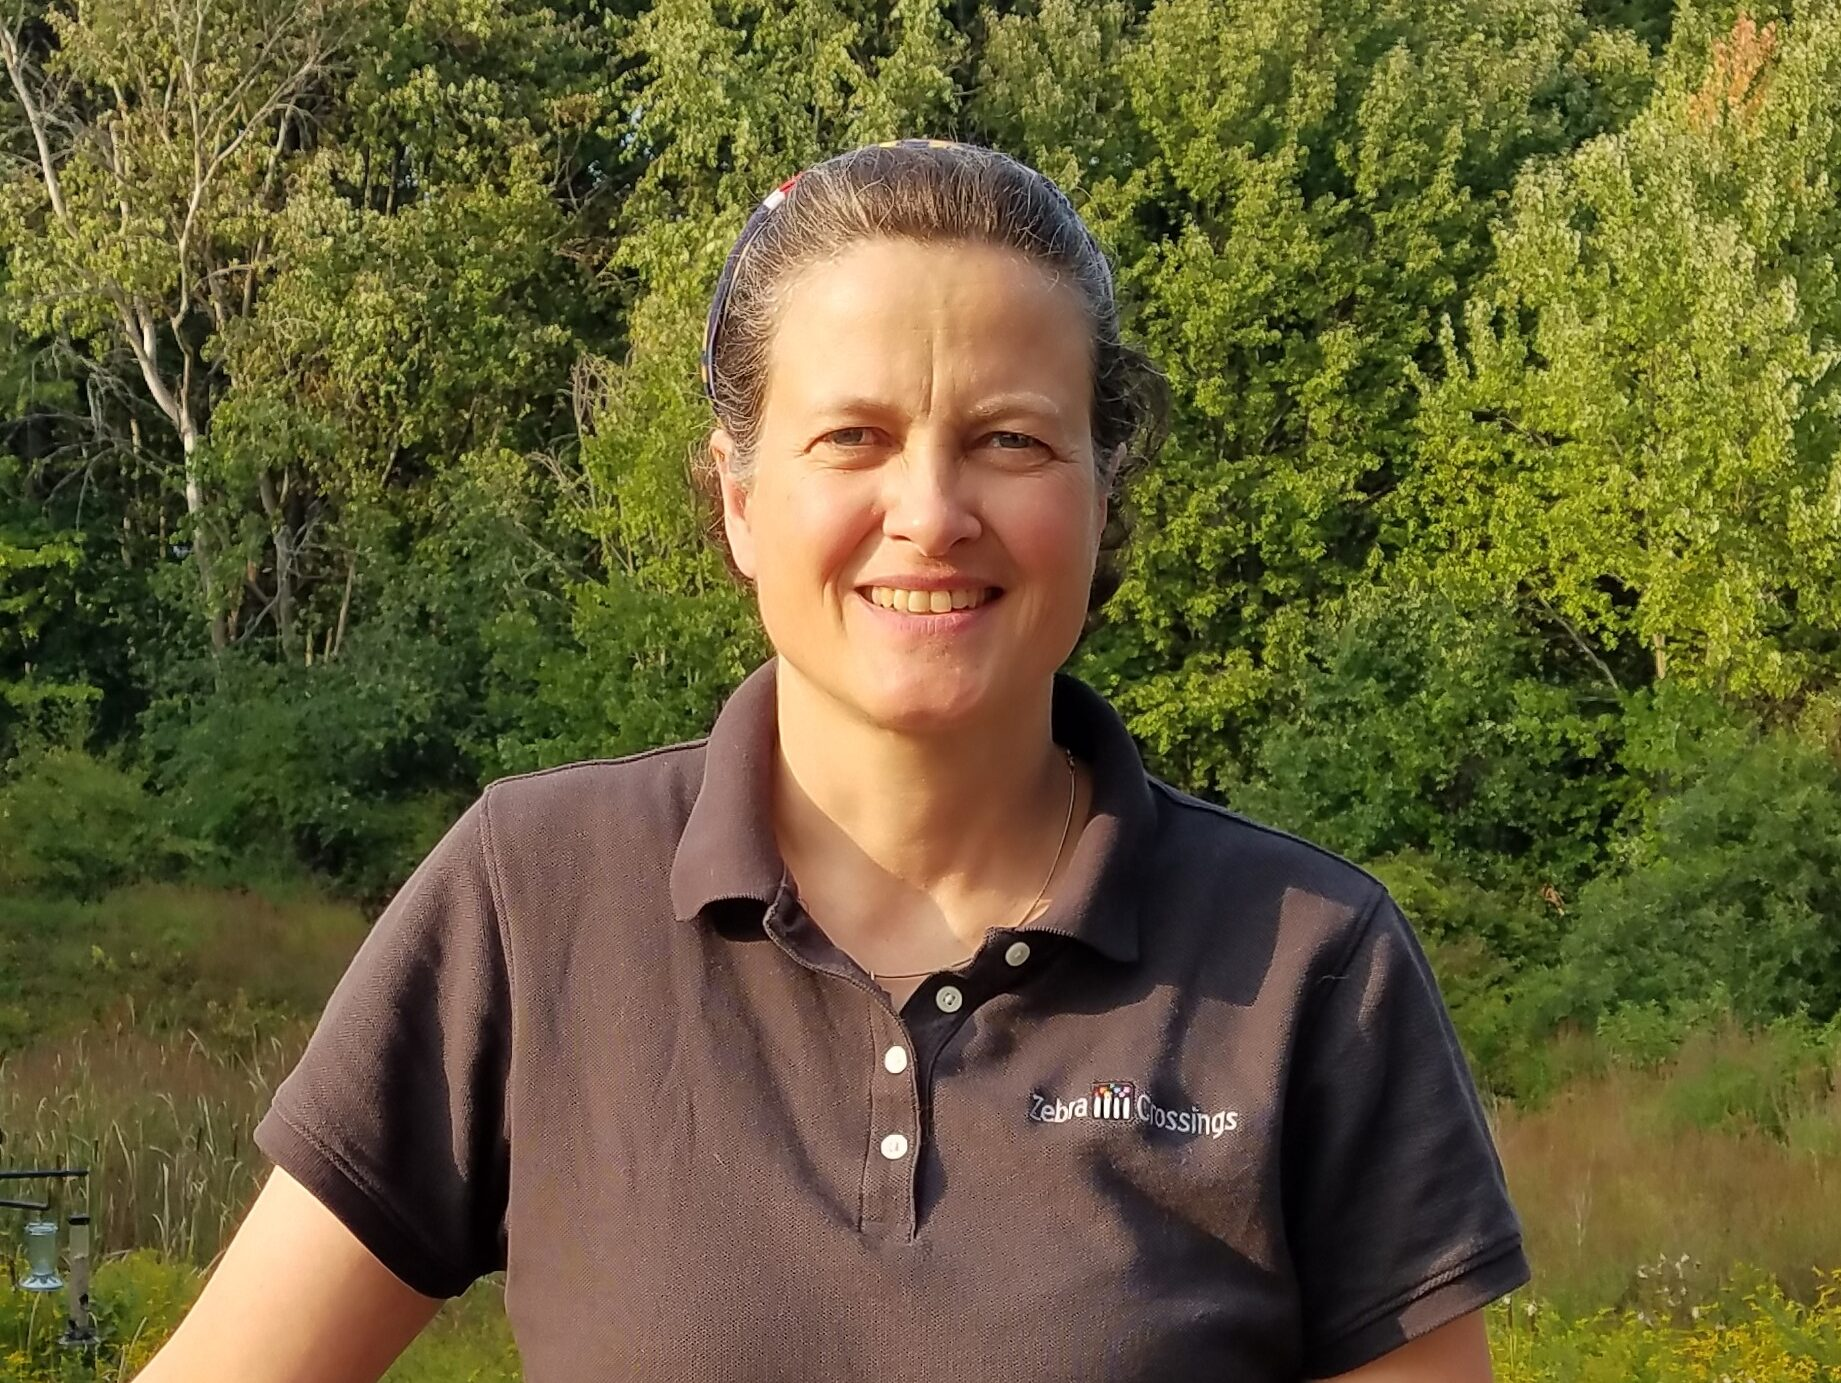 Astrid Wielens